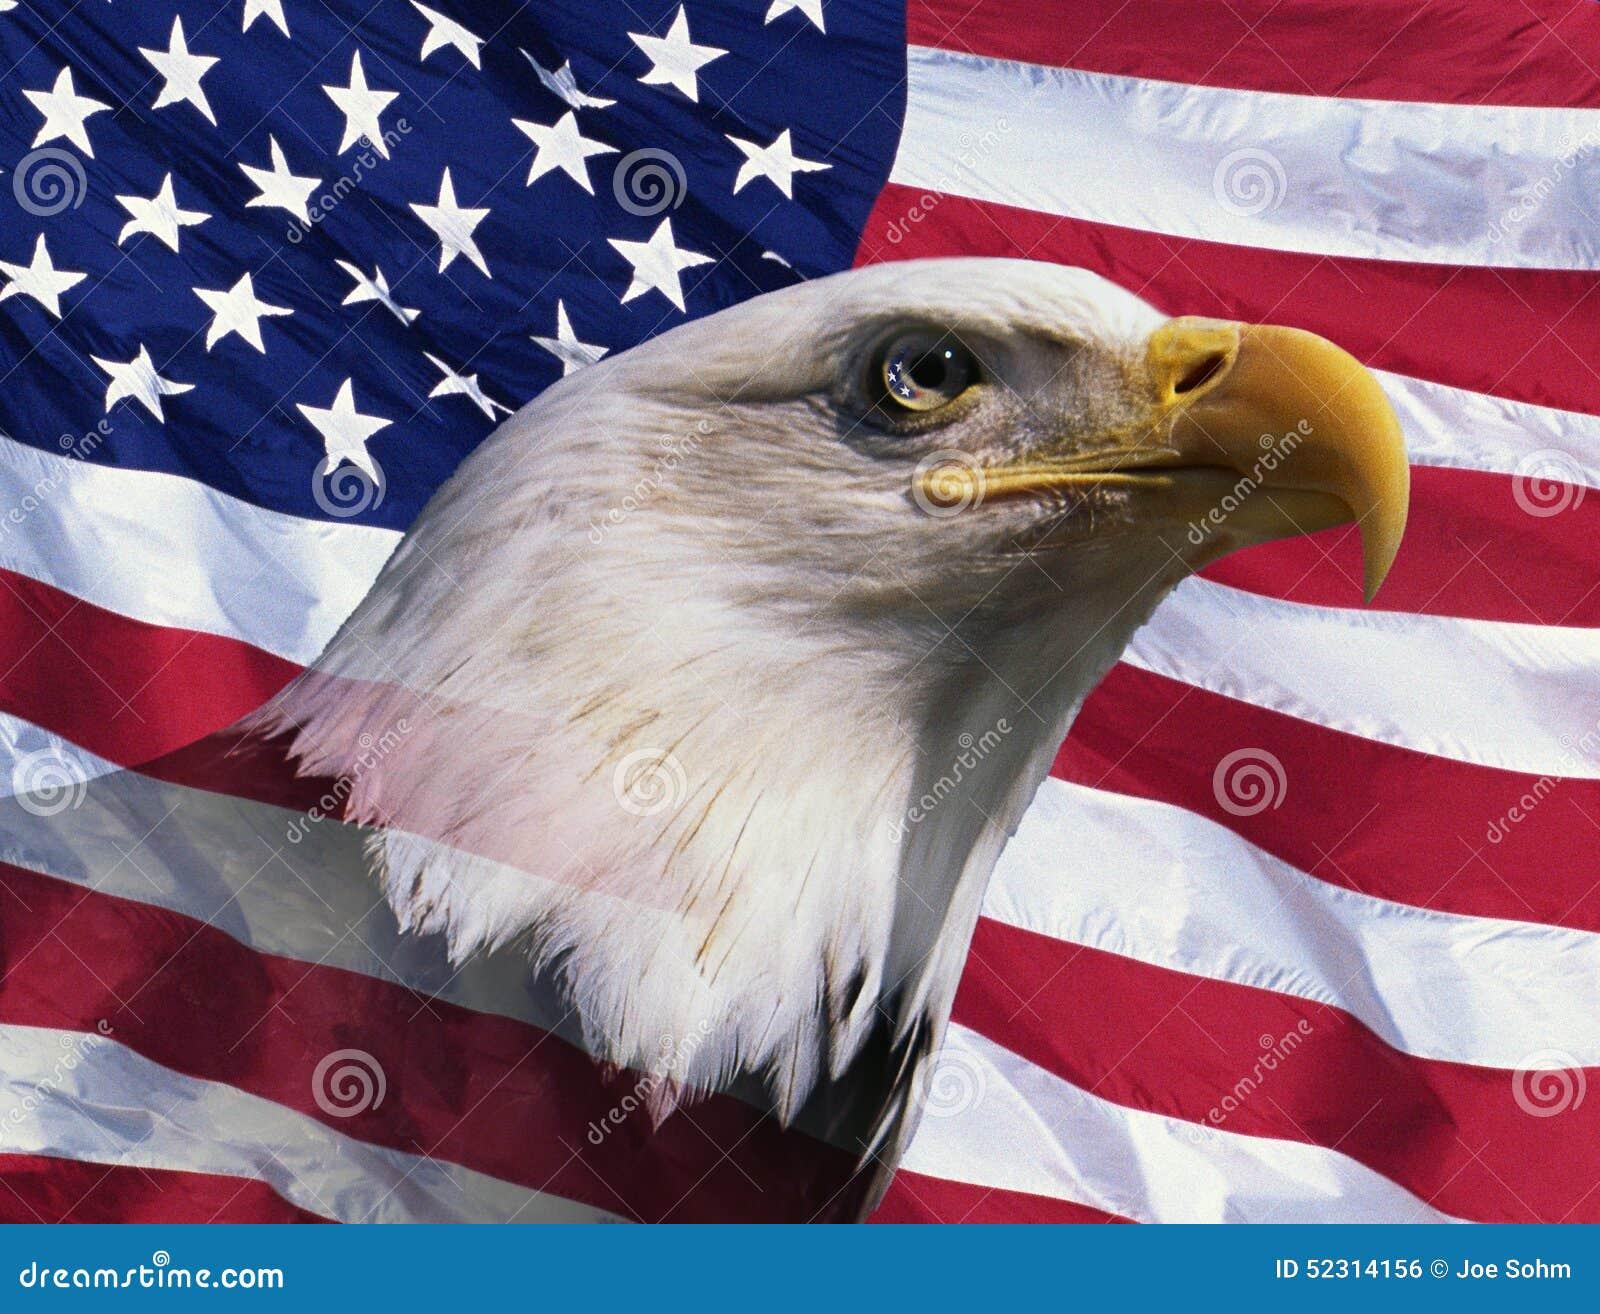 American Eagle Flag Stock Photos Download 1 294 Royalty Free Photos